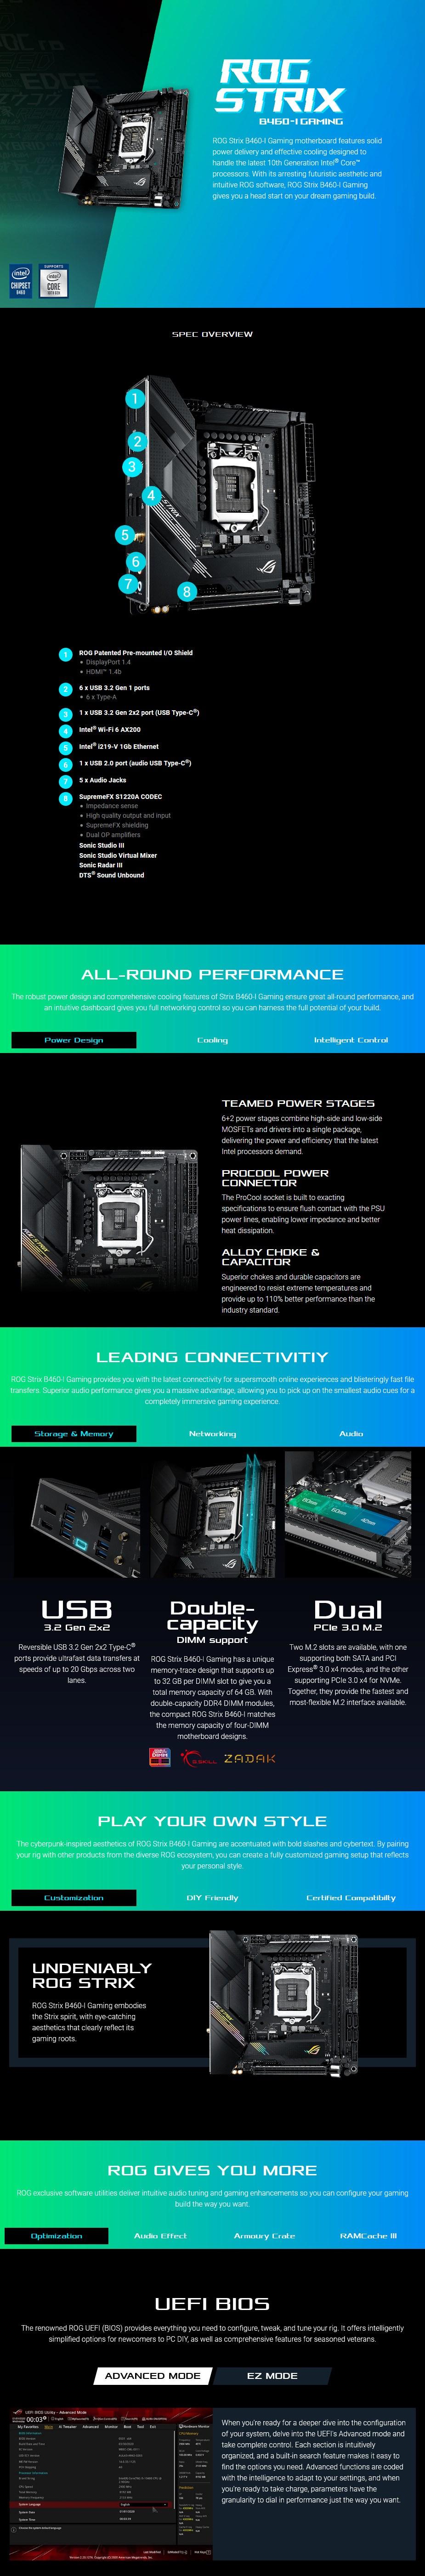 asus-rog-strix-b460i-gaming-lga-1200-miniitx-motherboard-ac35252-10-1-.jpg